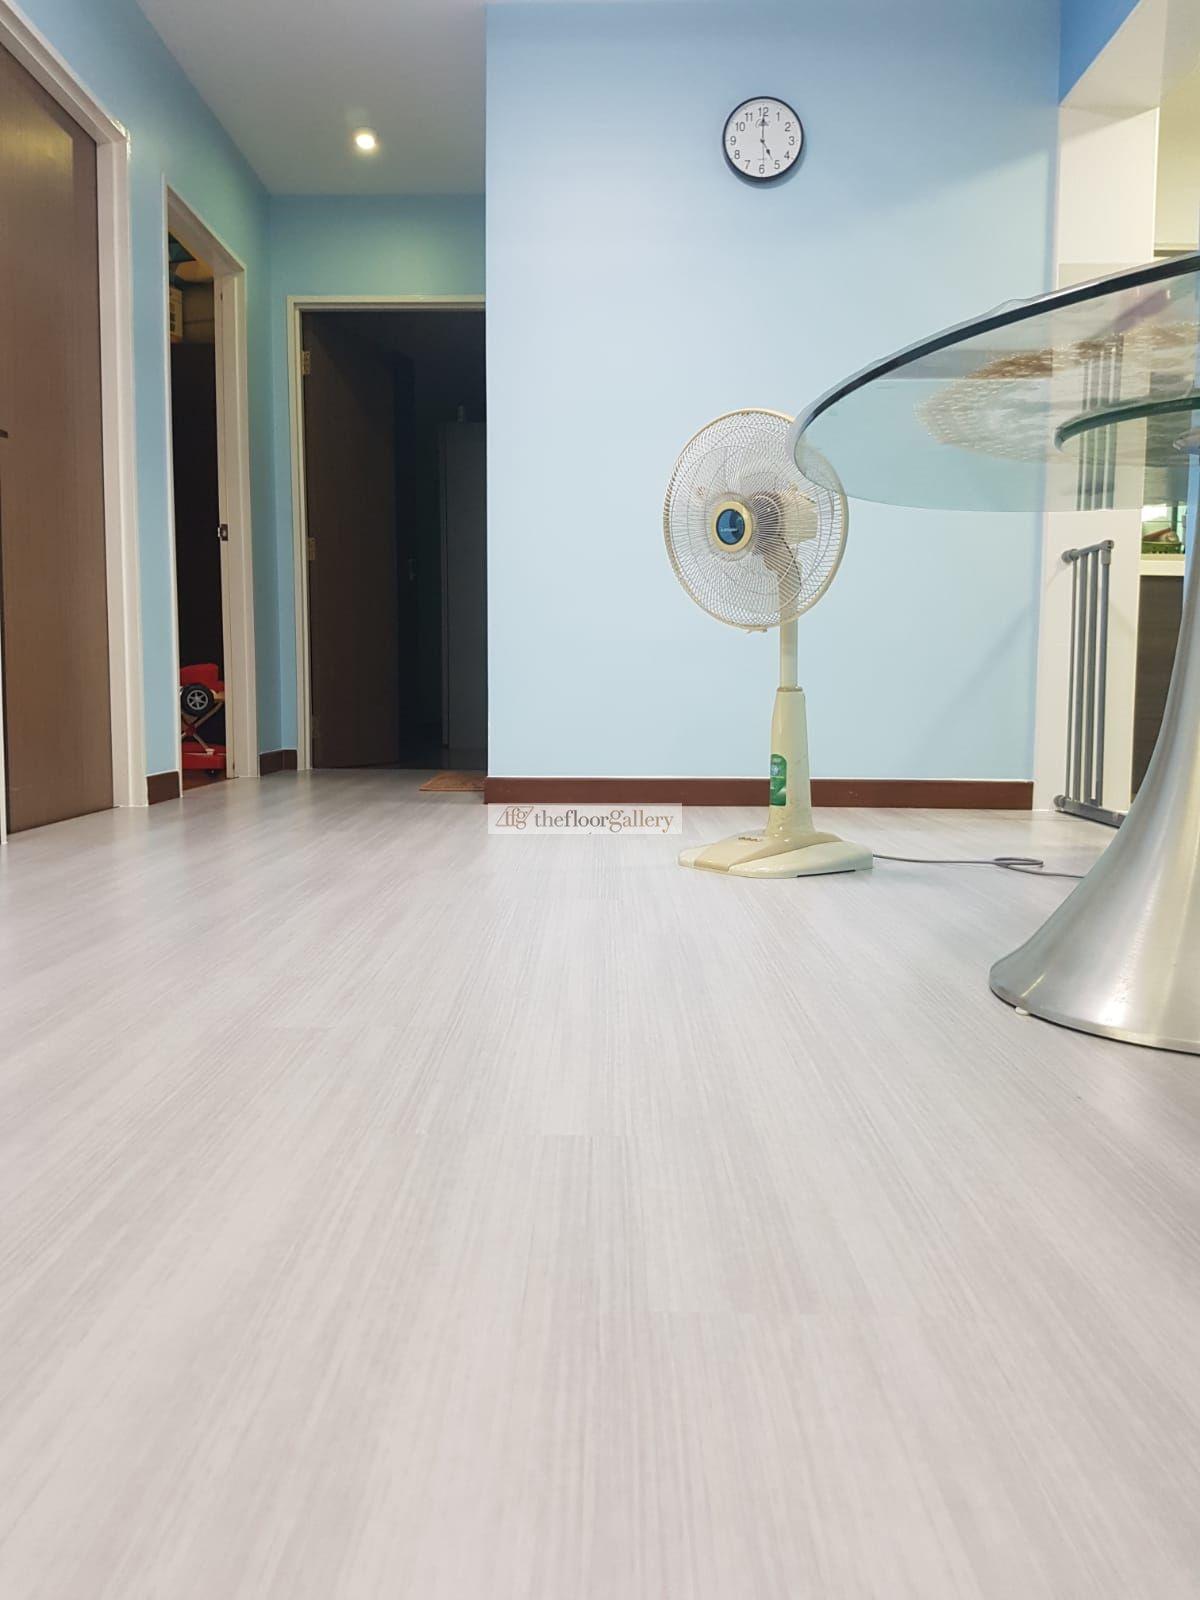 SGBC certified Excellent EcoFriendly vinyl flooring. Low